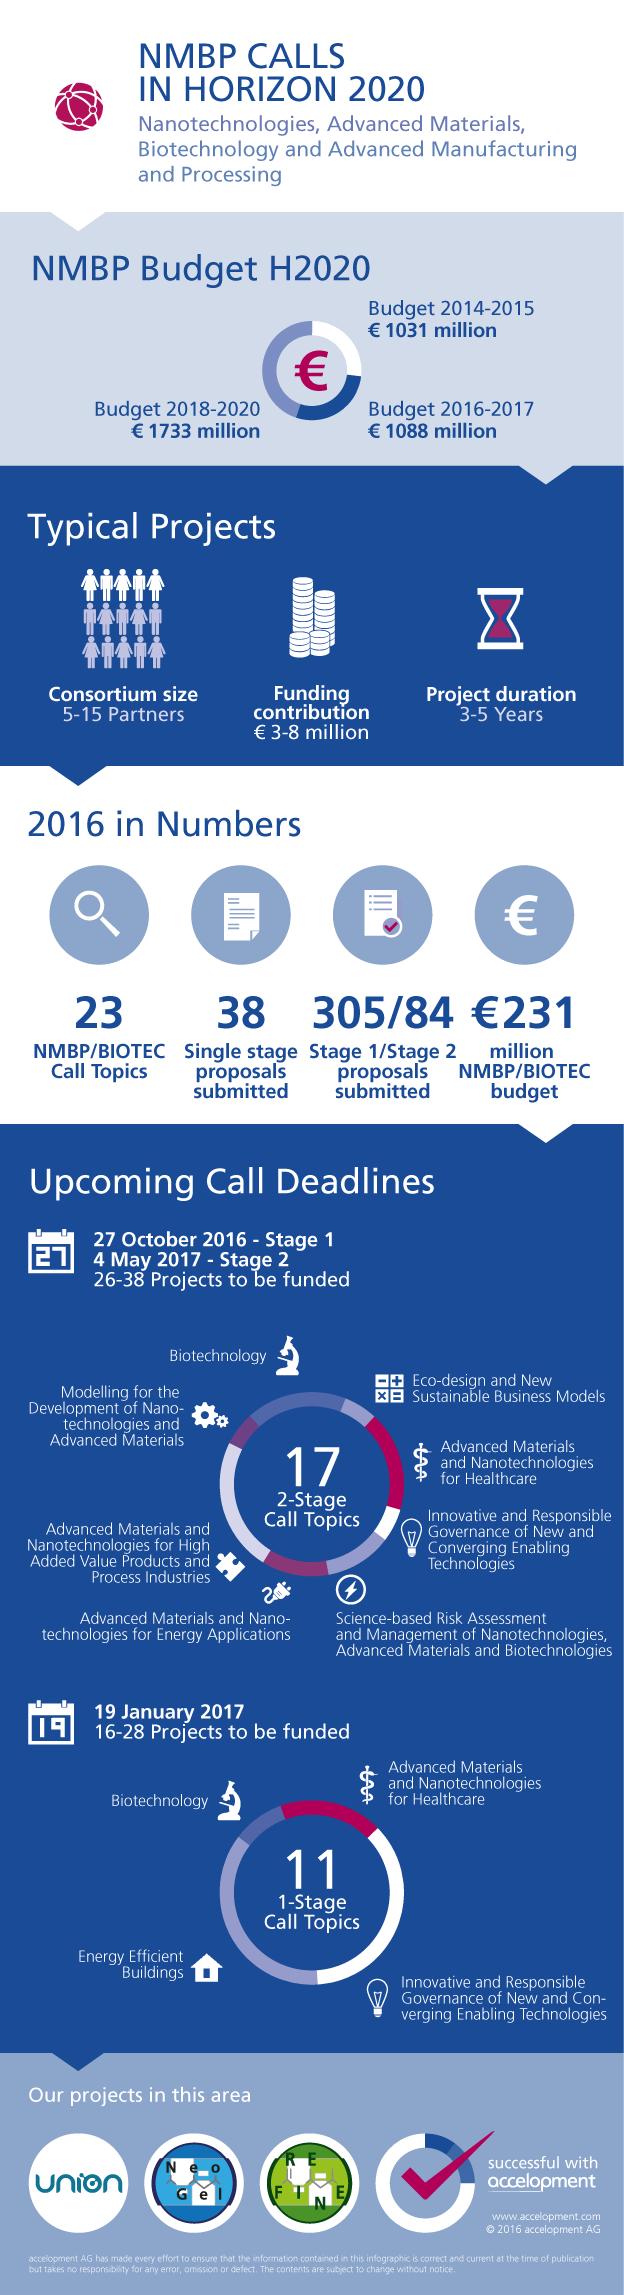 accelopment_infographic_nmbp_calls